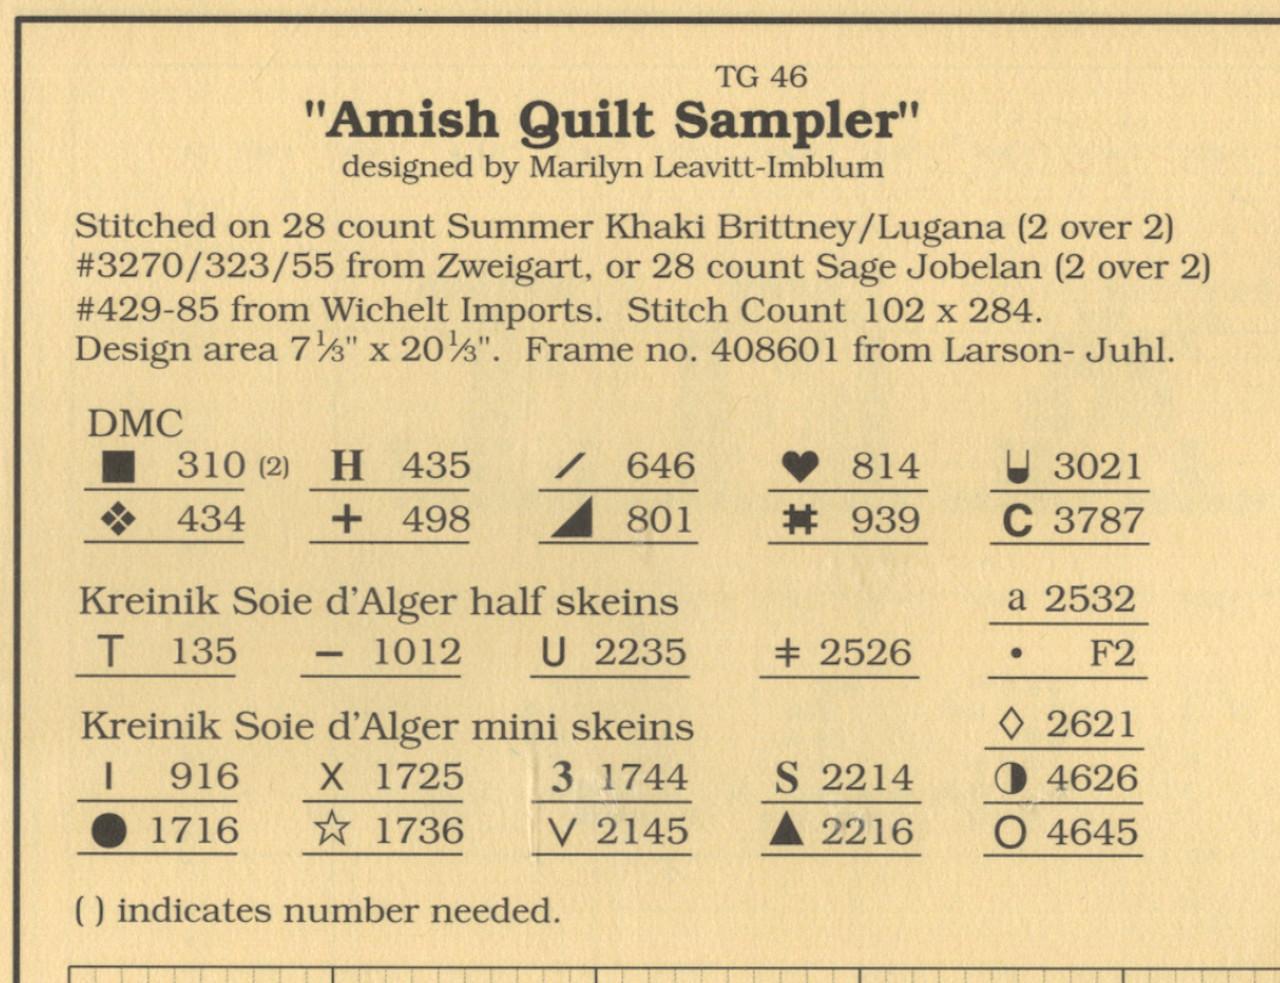 Told In A Garden - Amish Quilt Sampler